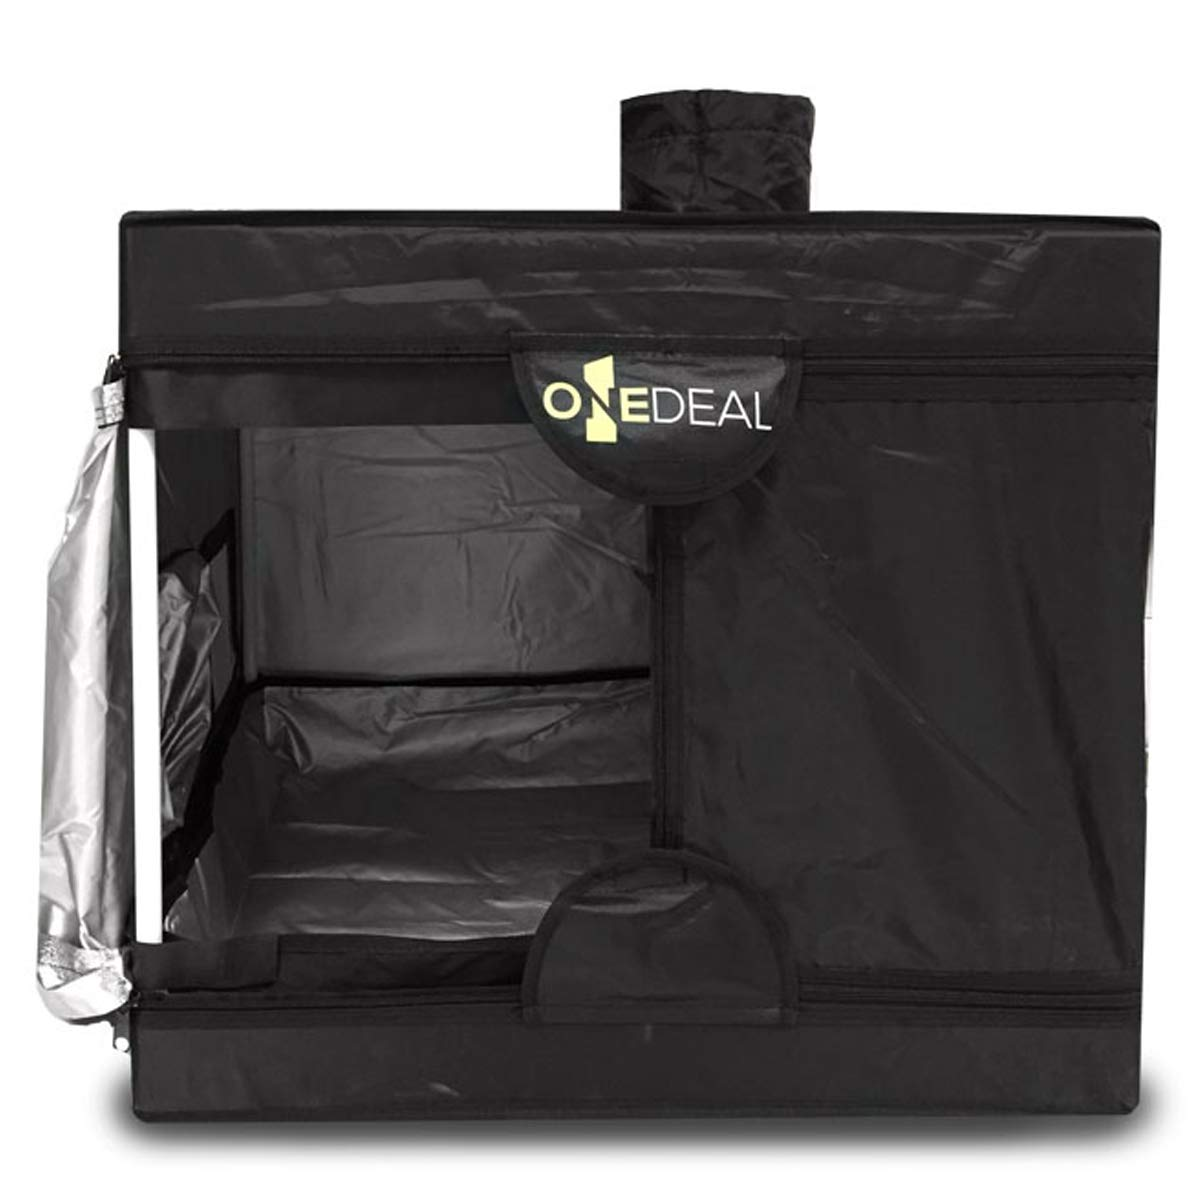 OneDeal 2 x 2 Mini Clone Box